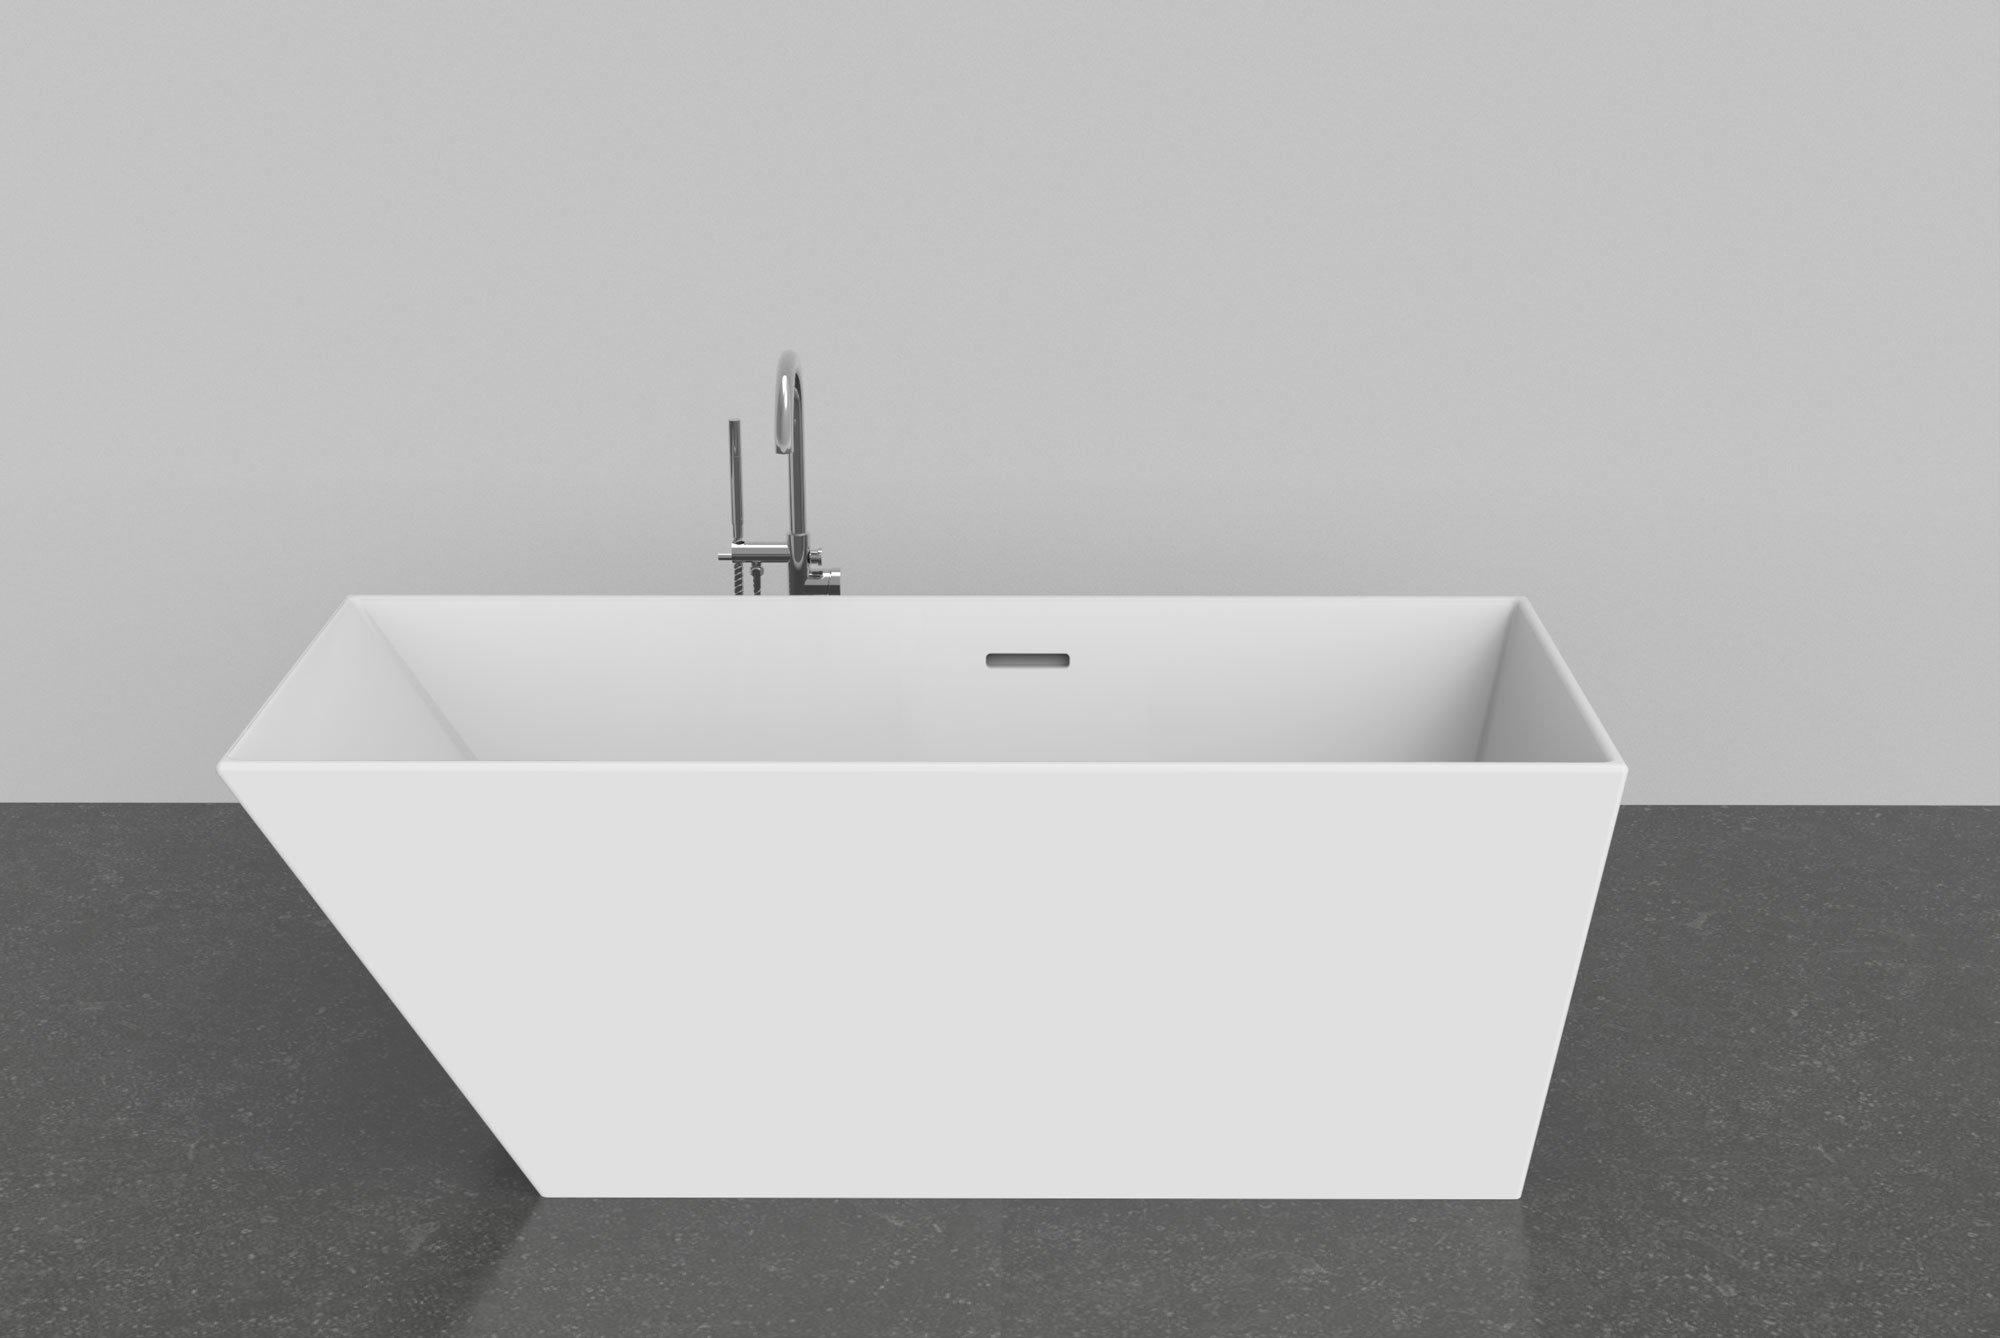 Vasche da bagno in corian duraltop - Vasche da bagno su misura ...